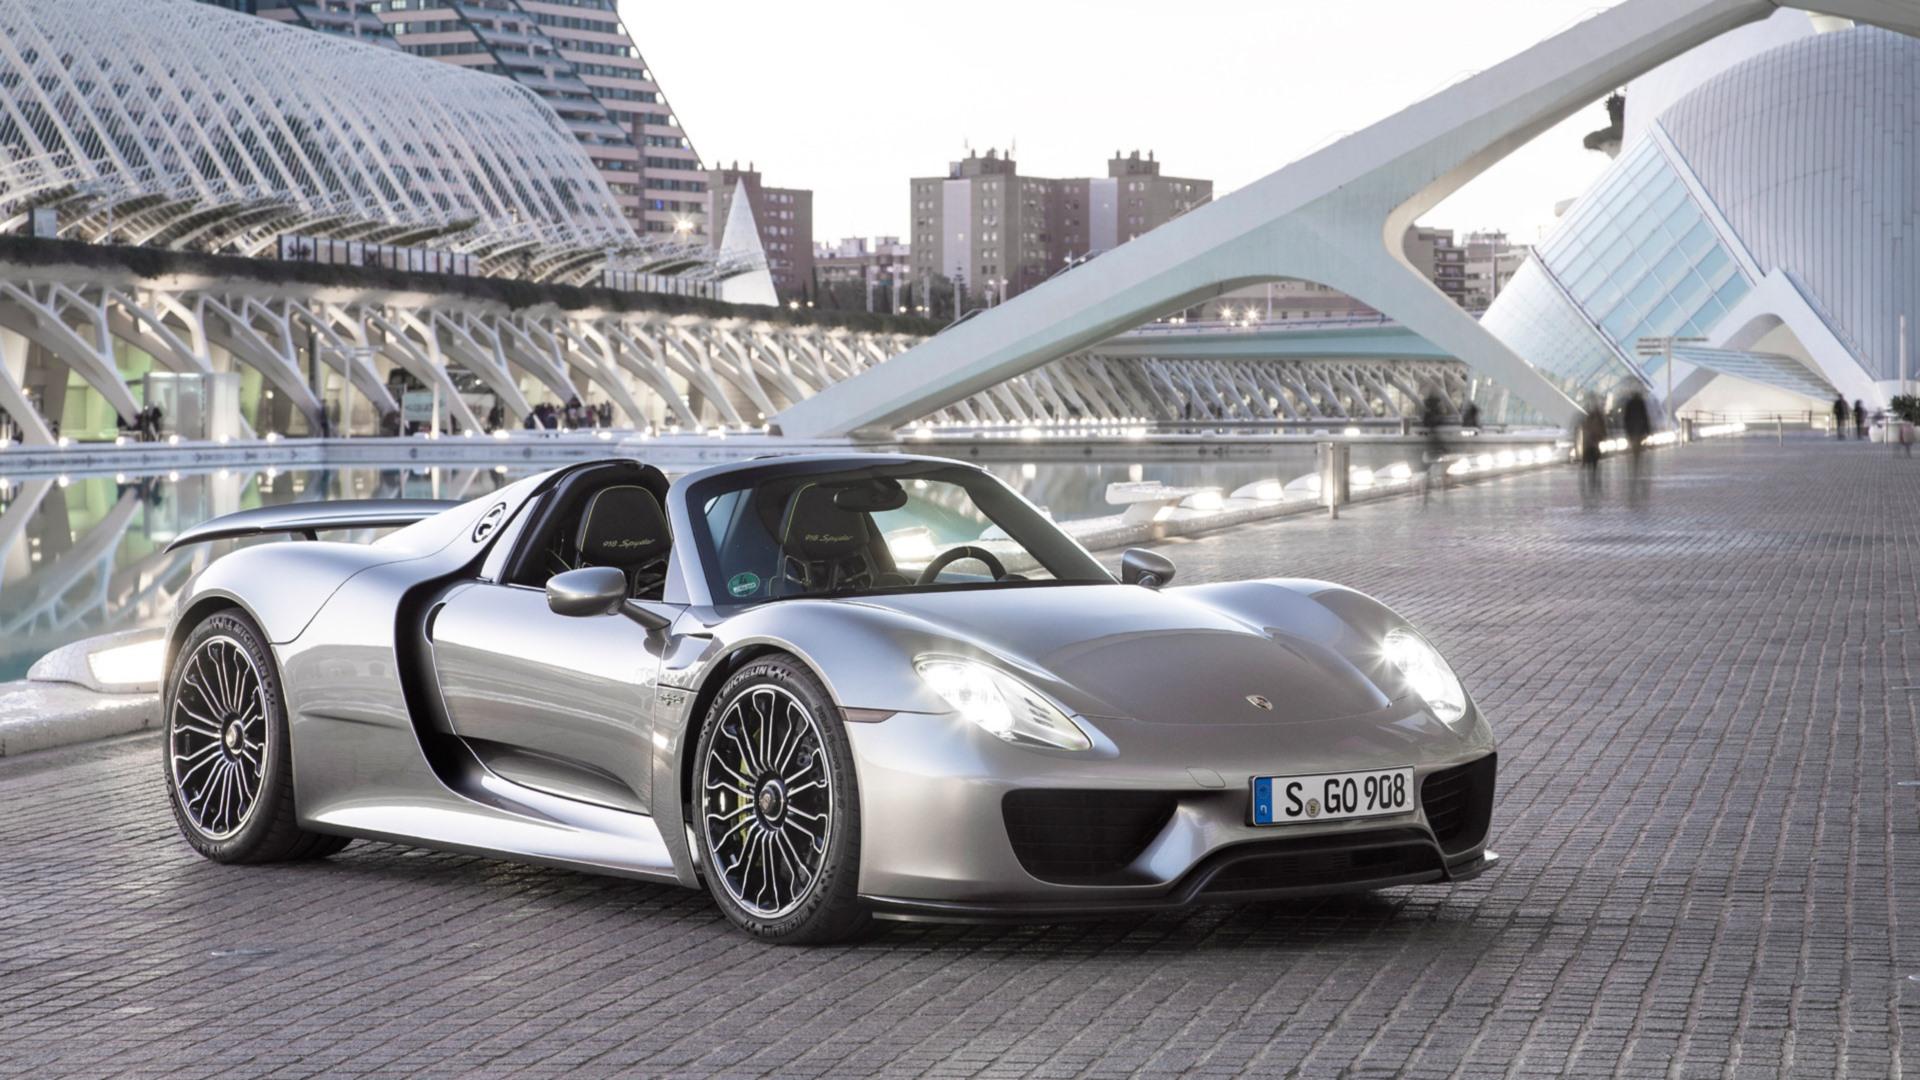 Porsche 918 Spyder Wallpapers Pictures Images